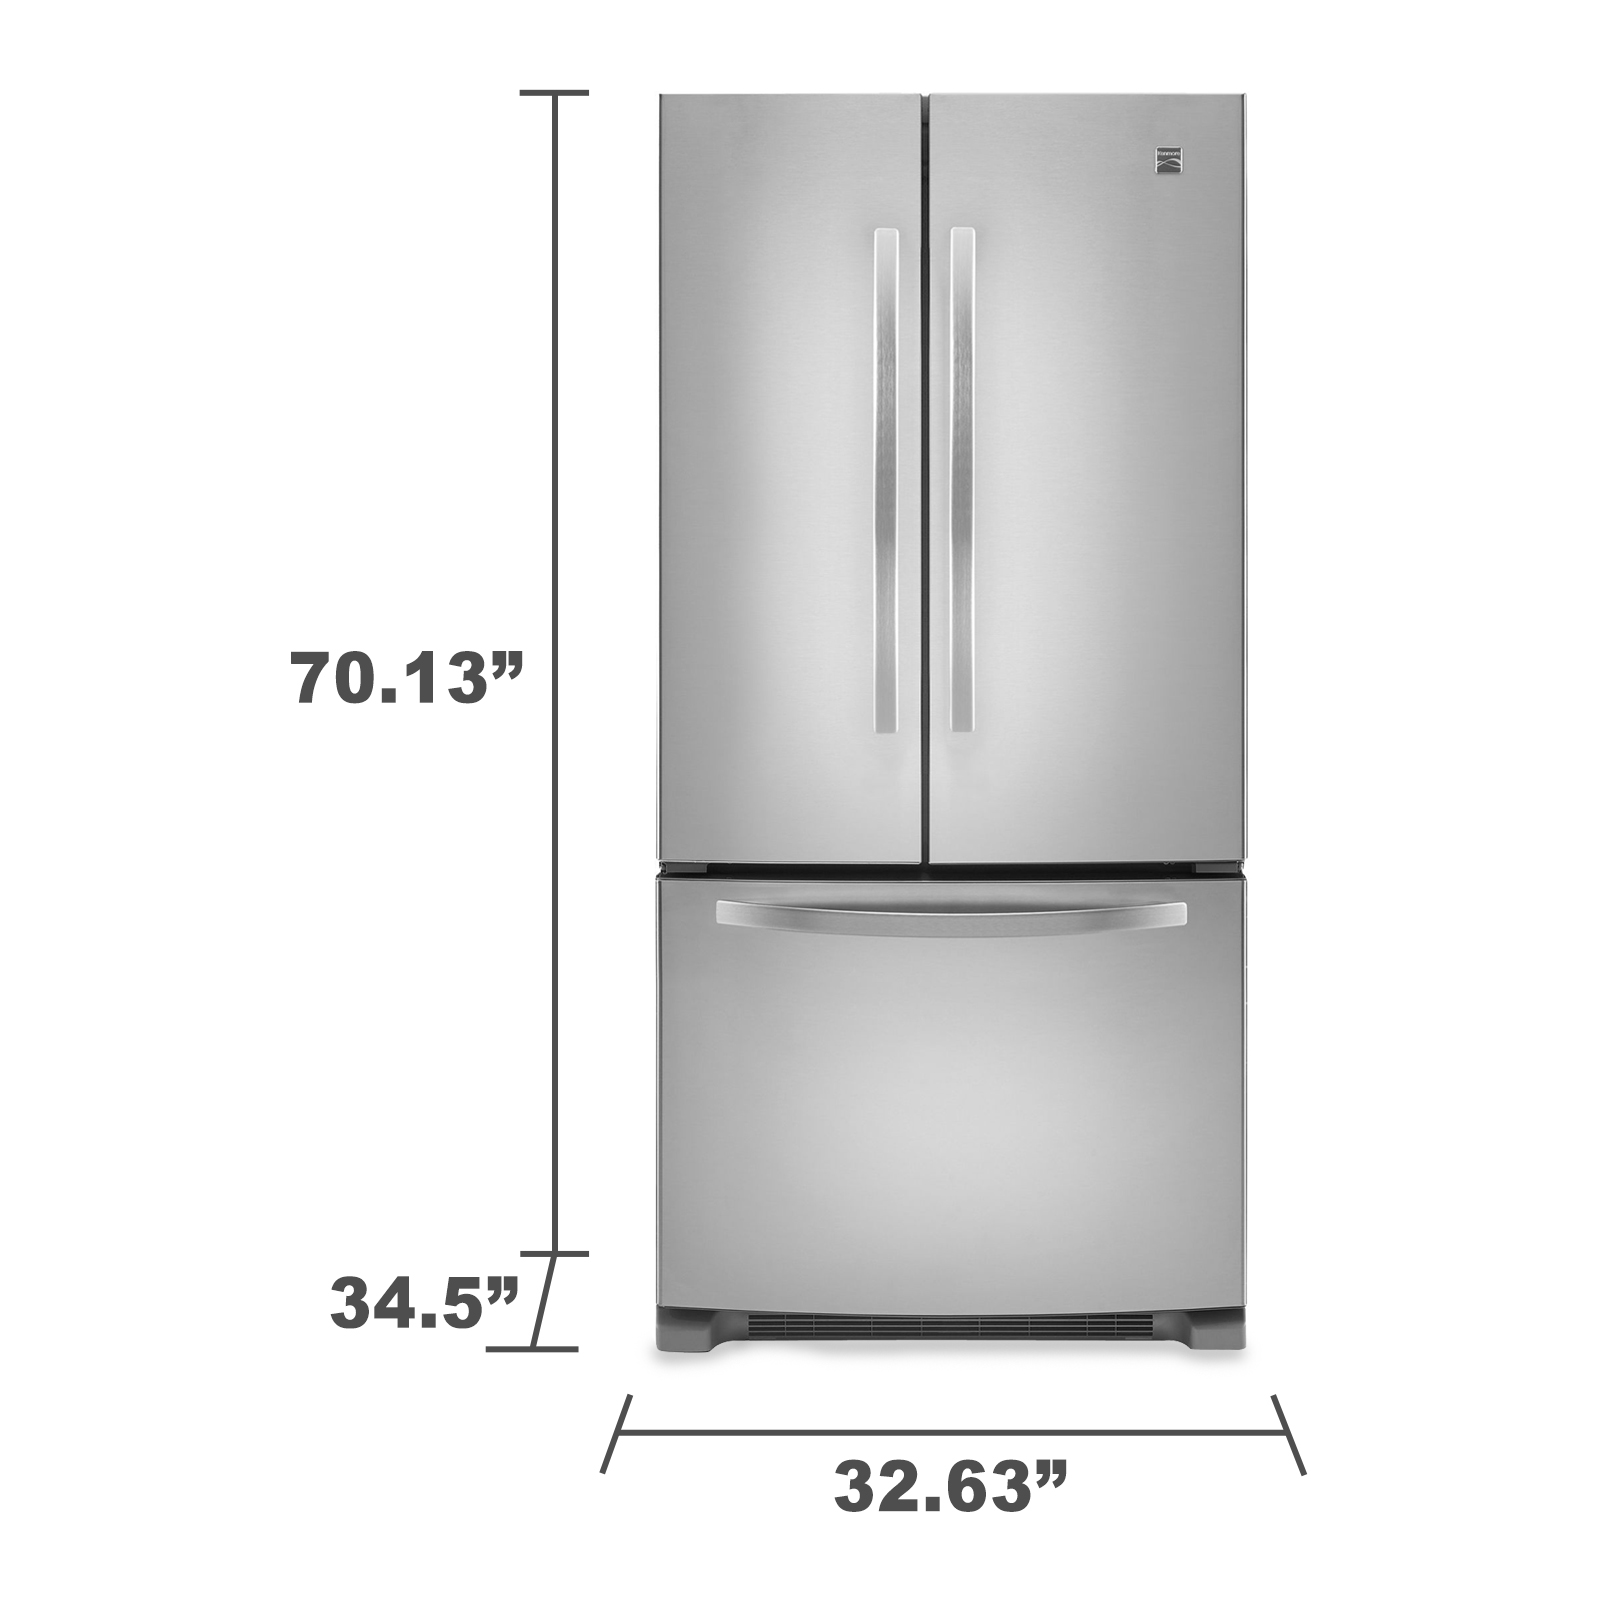 Kenmore 72003 22.1 cu. ft. French Door Bottom-Freezer Refrigerator w/Internal Dispenser - Stainless Steel